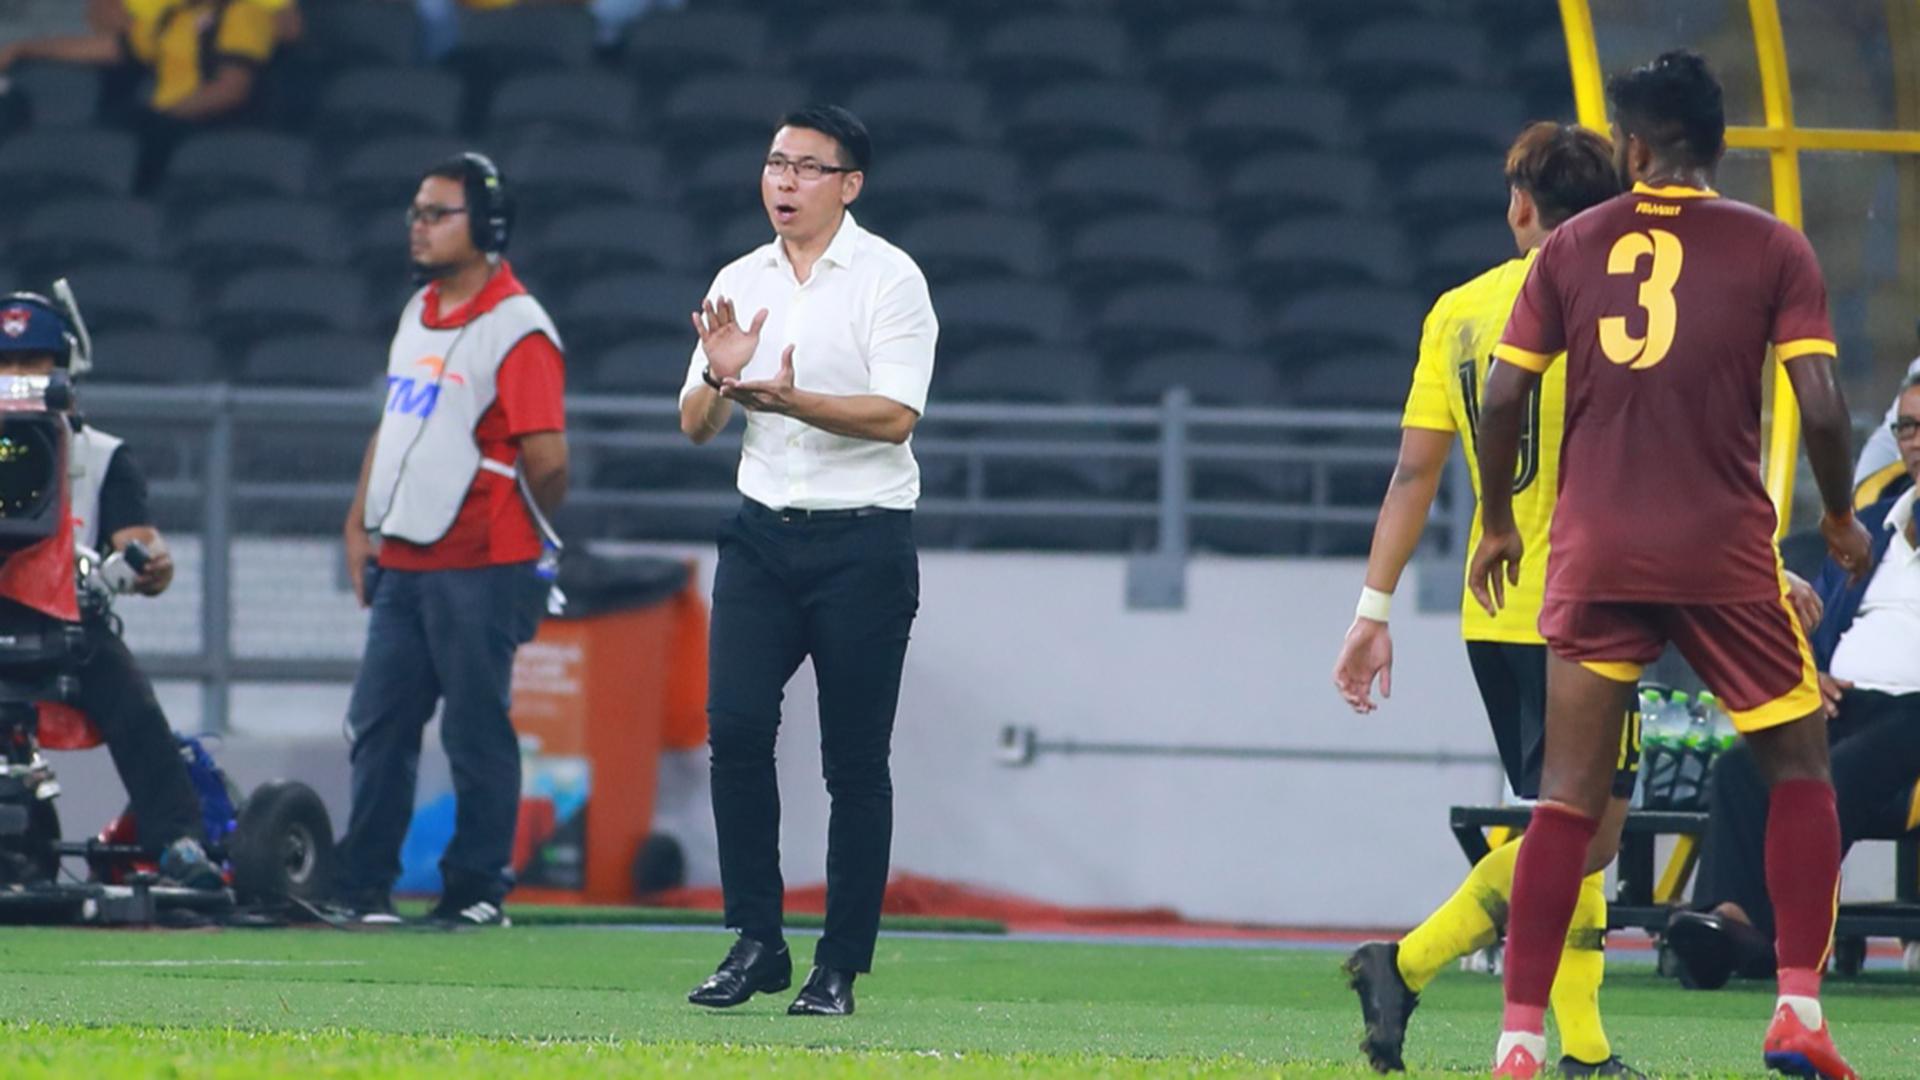 Tan Cheng Hoe, Malaysia v Sri Lanka, International Friendly, 5 Oct 2019